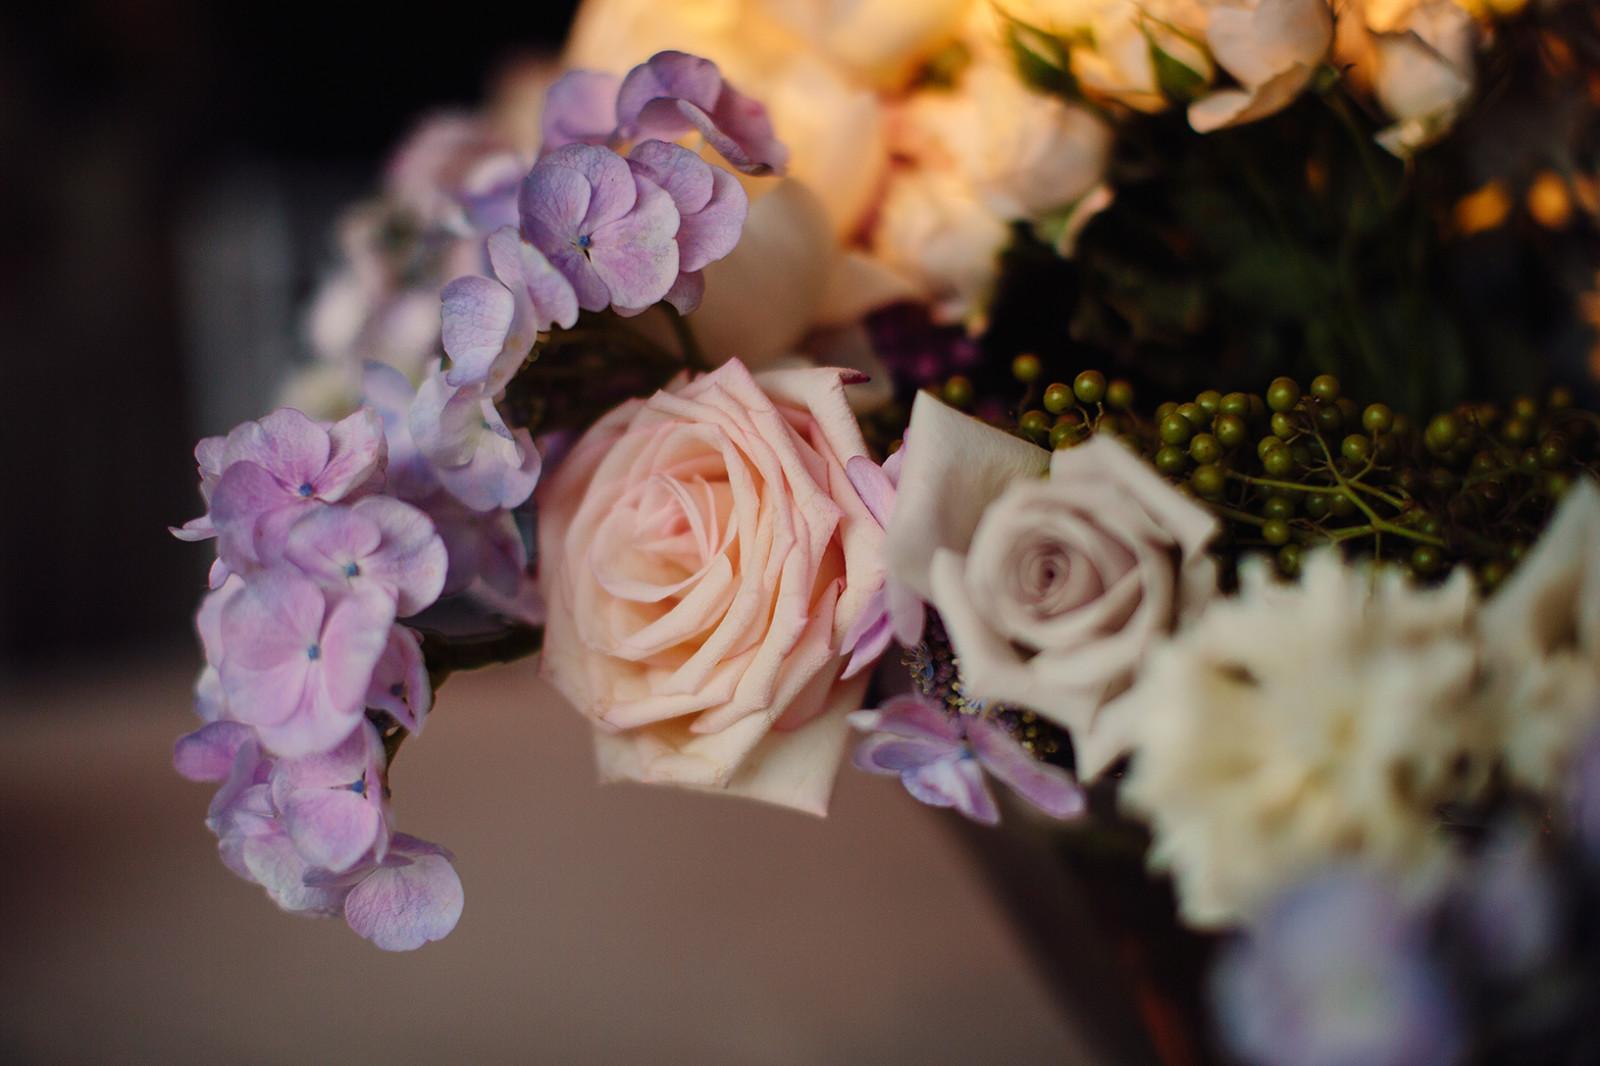 Grandiflora-Sydney-Flowers